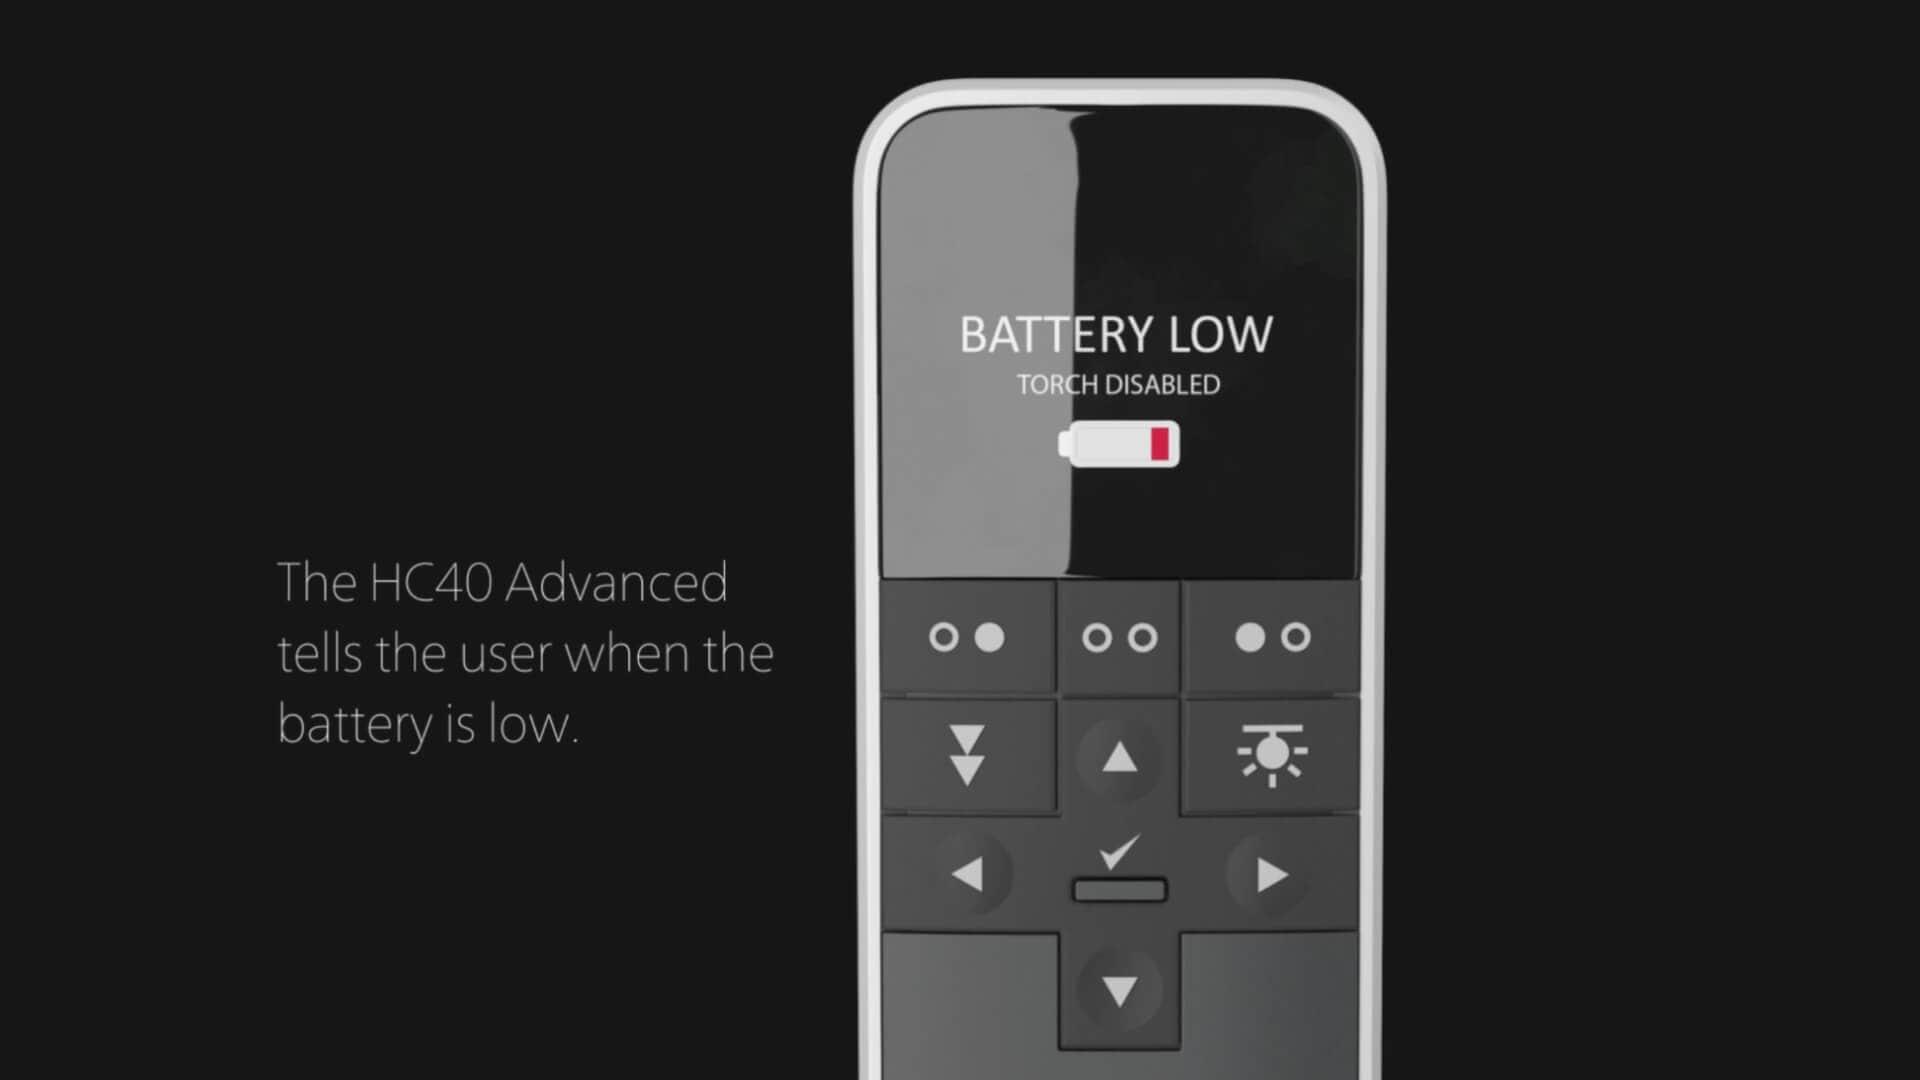 Hur man byter batterier i HC40